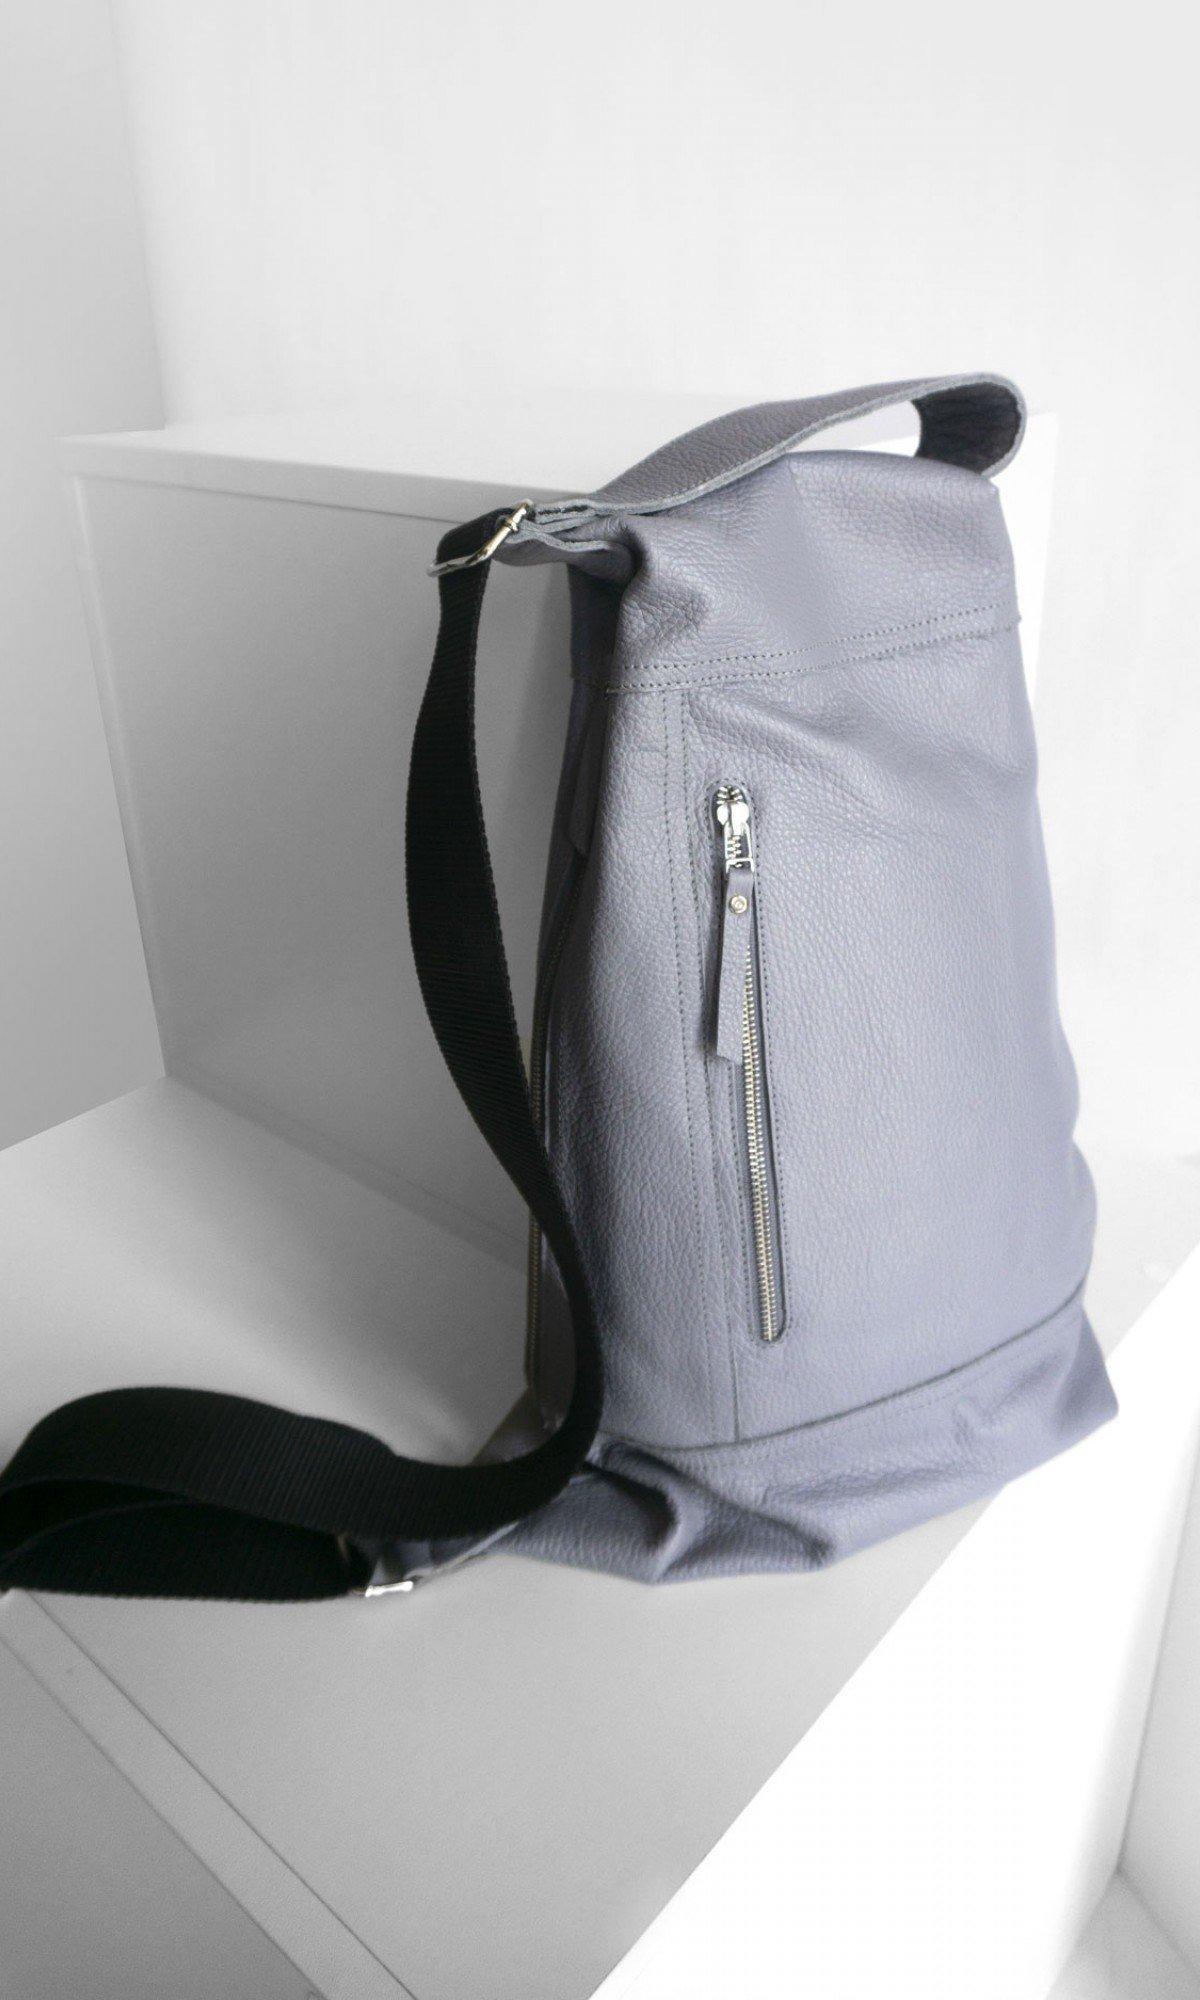 Extravagant crossbody backpack A90526